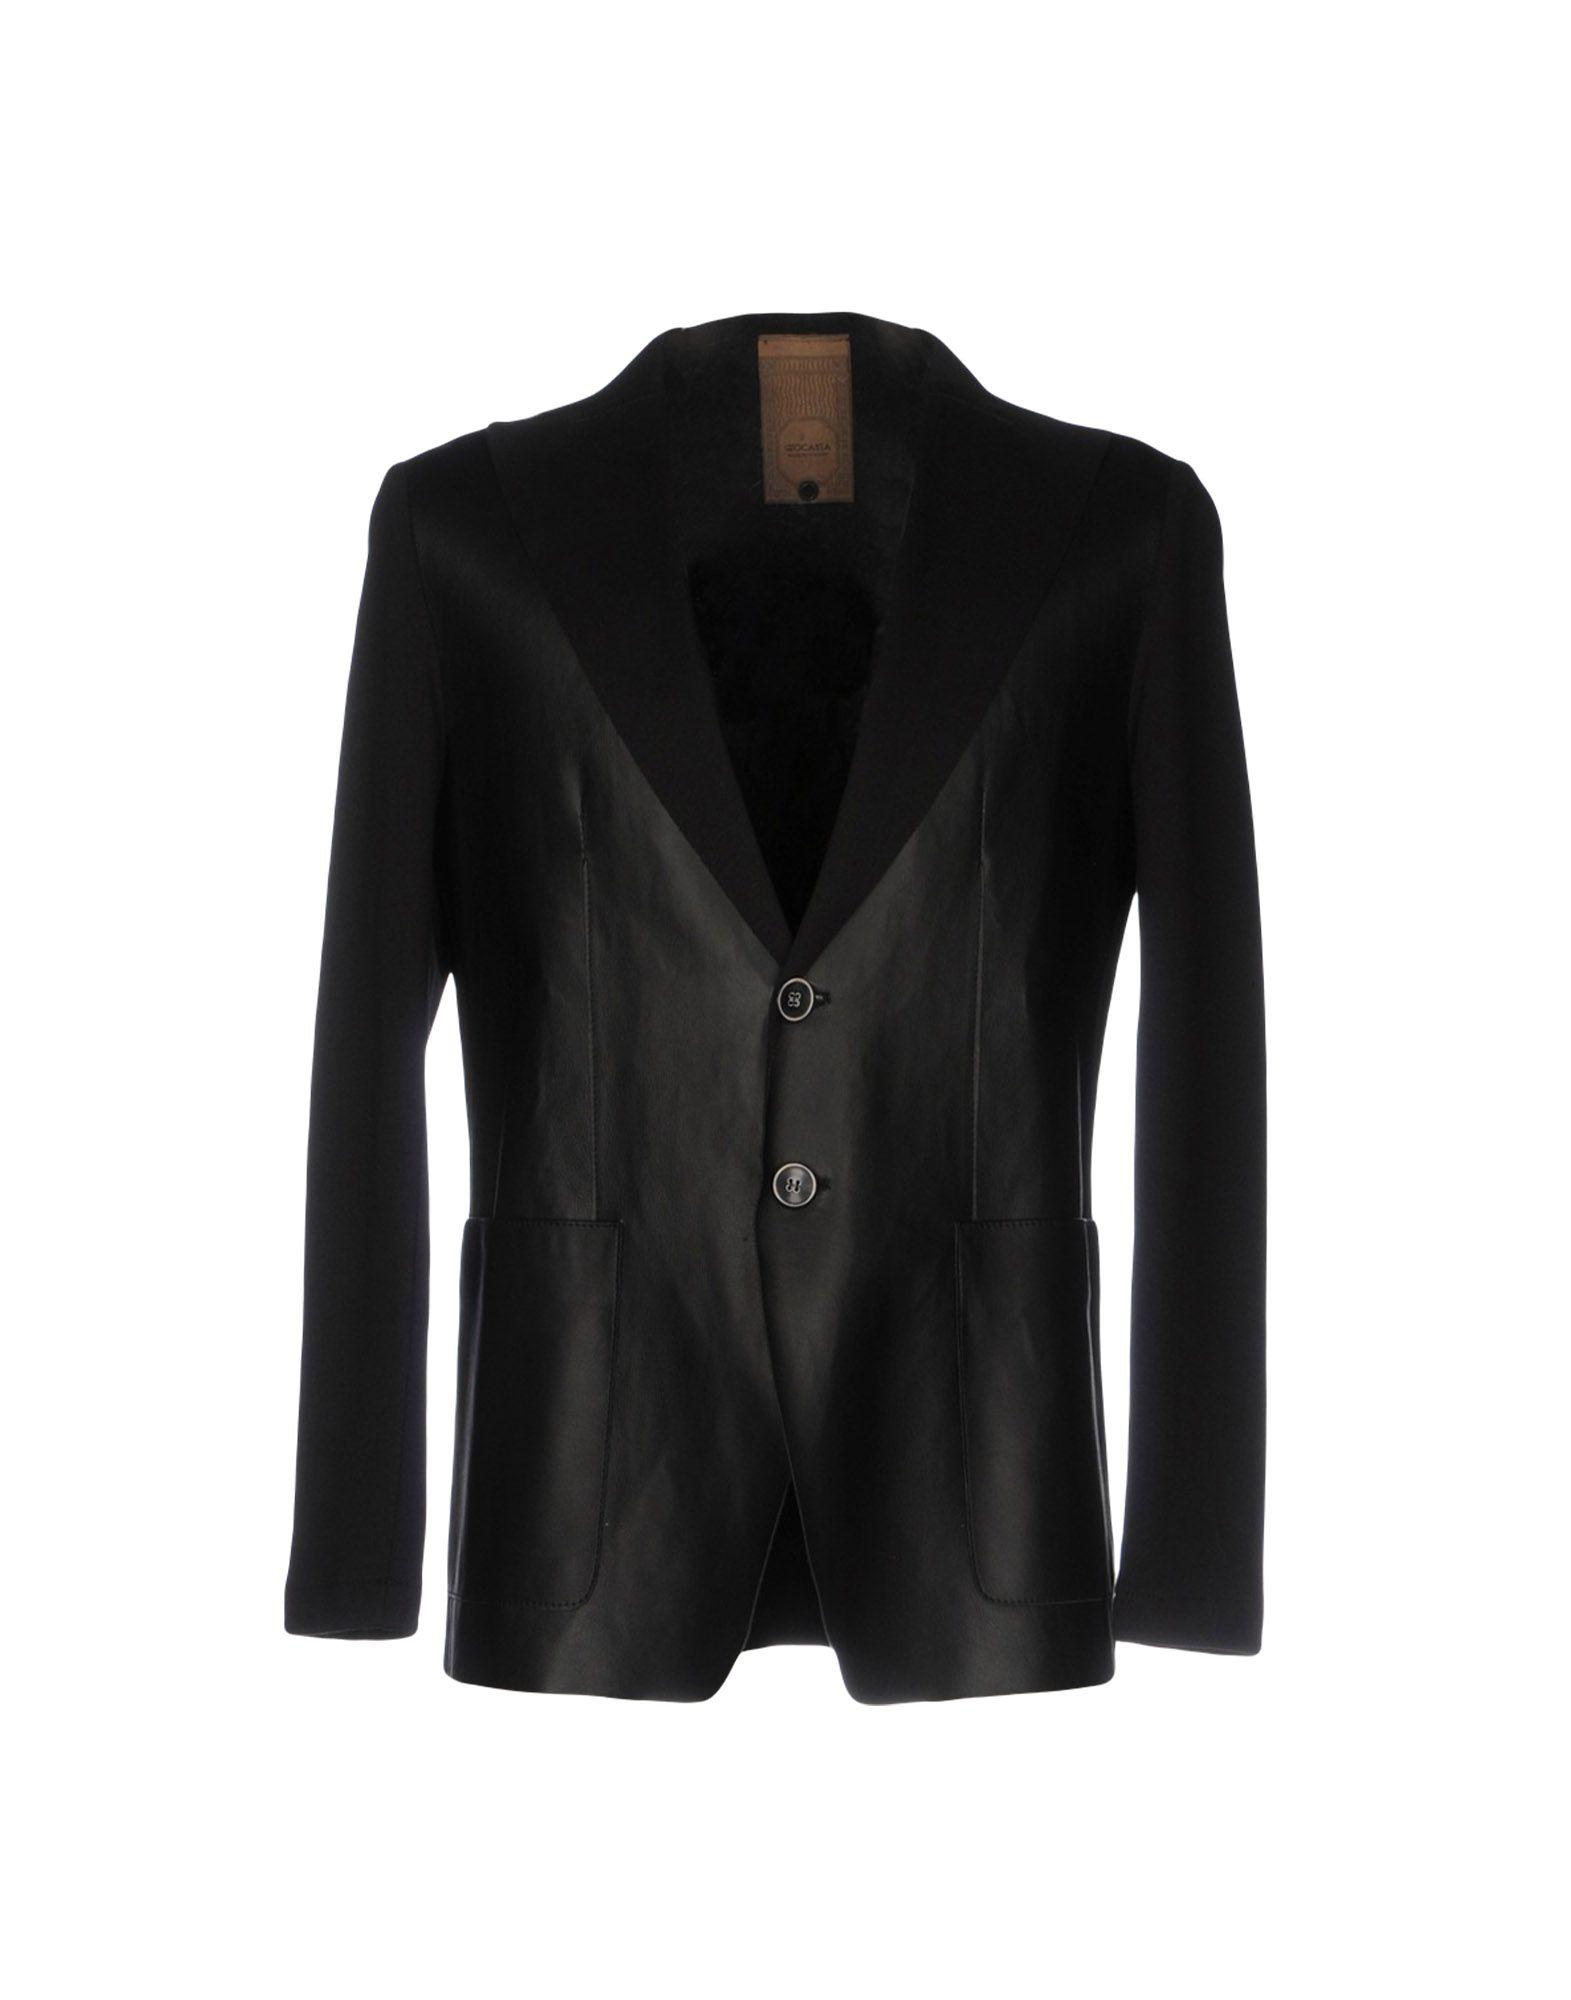 GIOCASTA Blazers in Black